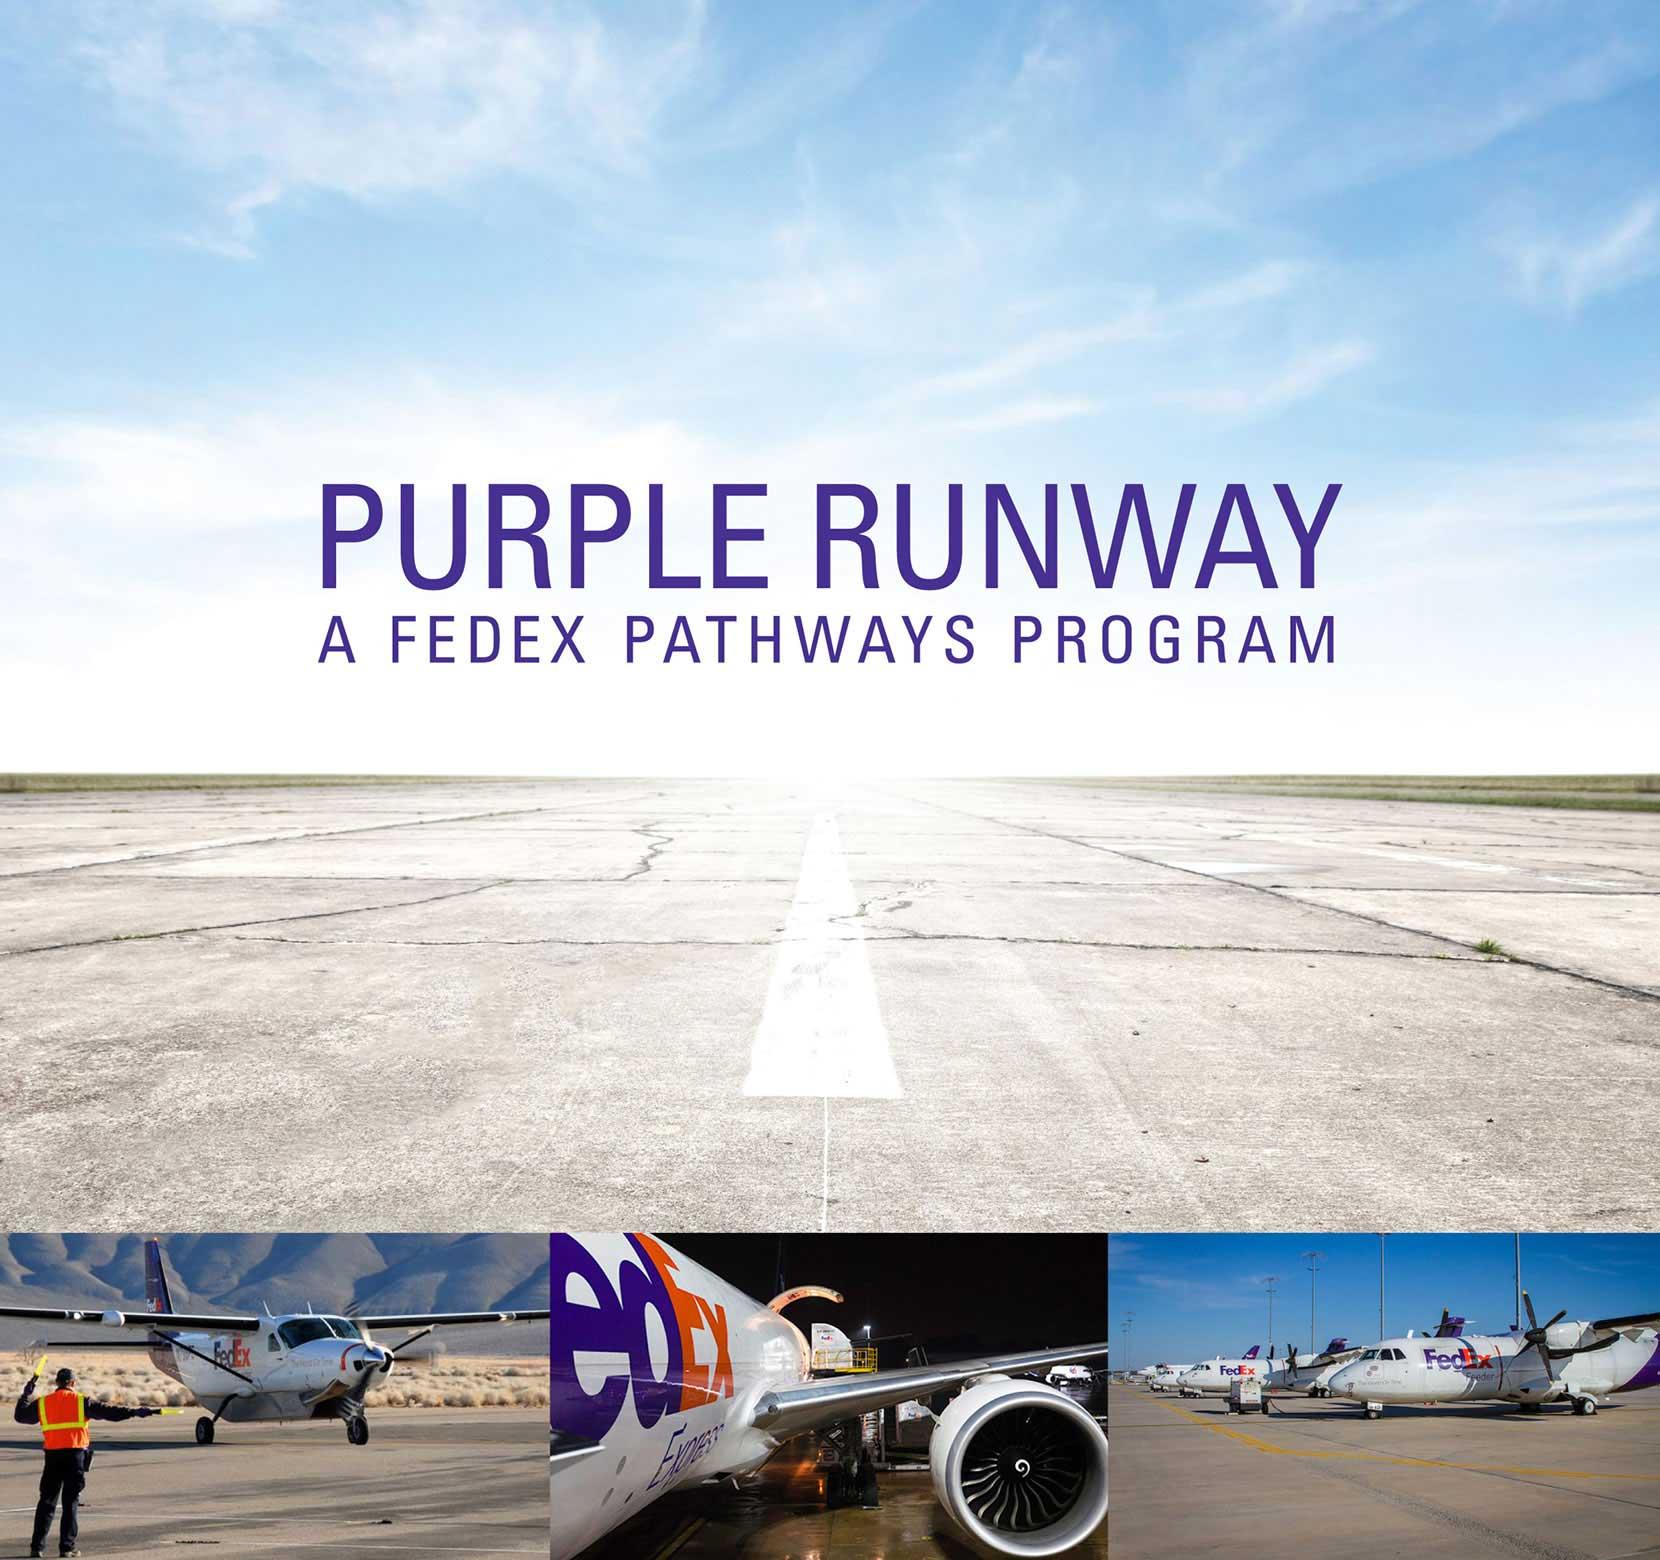 FedEx Purple Runway pilot training